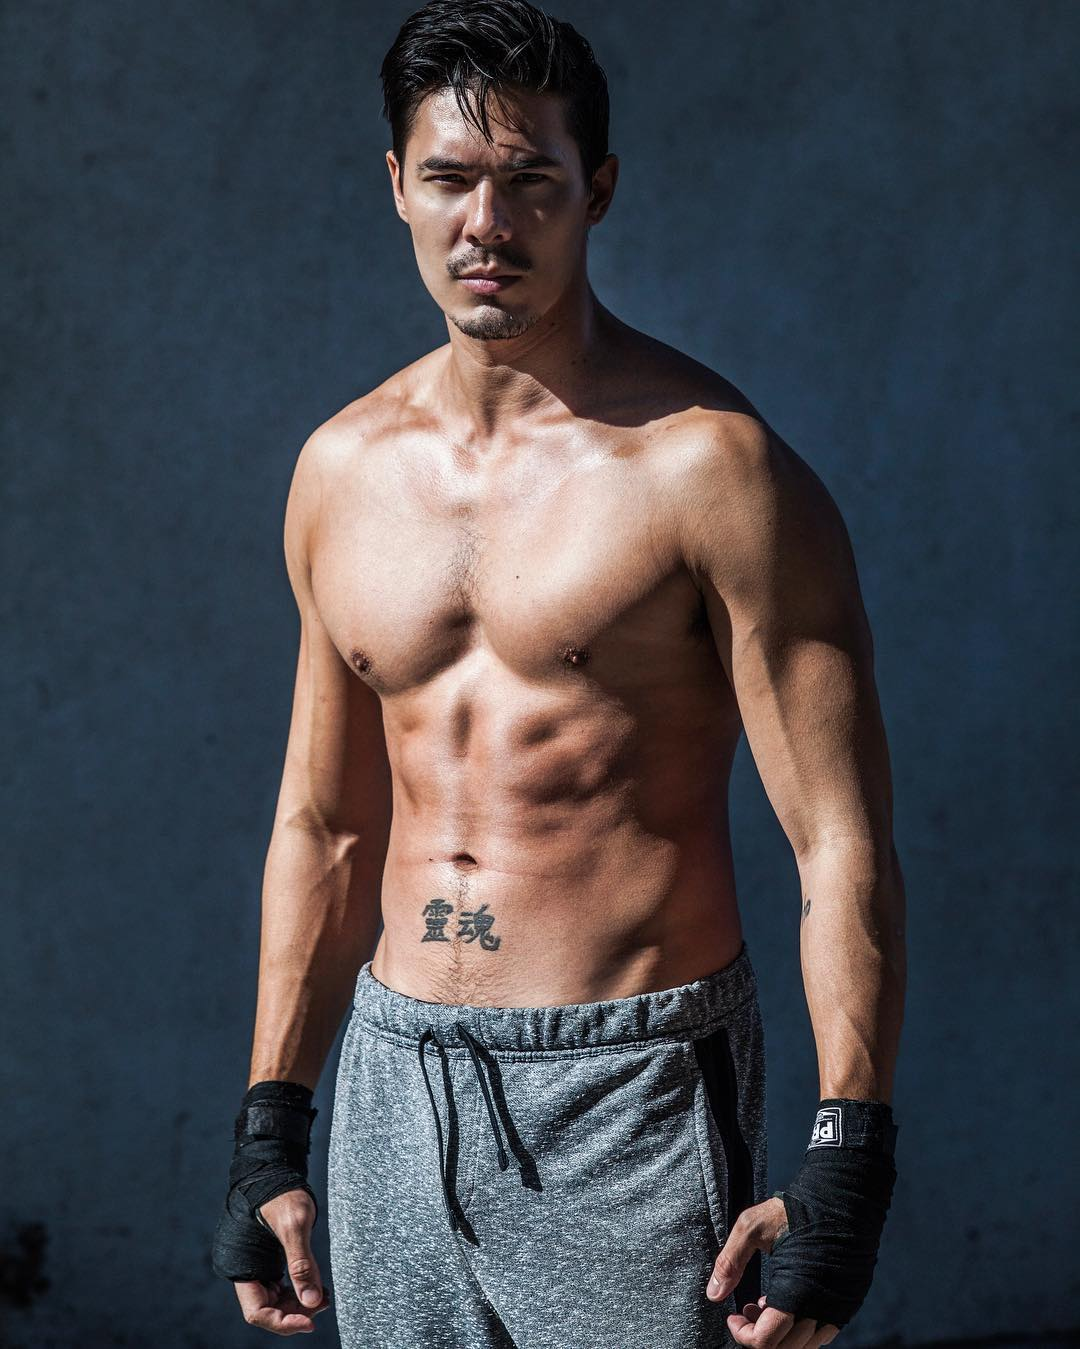 Sexiest man alive wiki